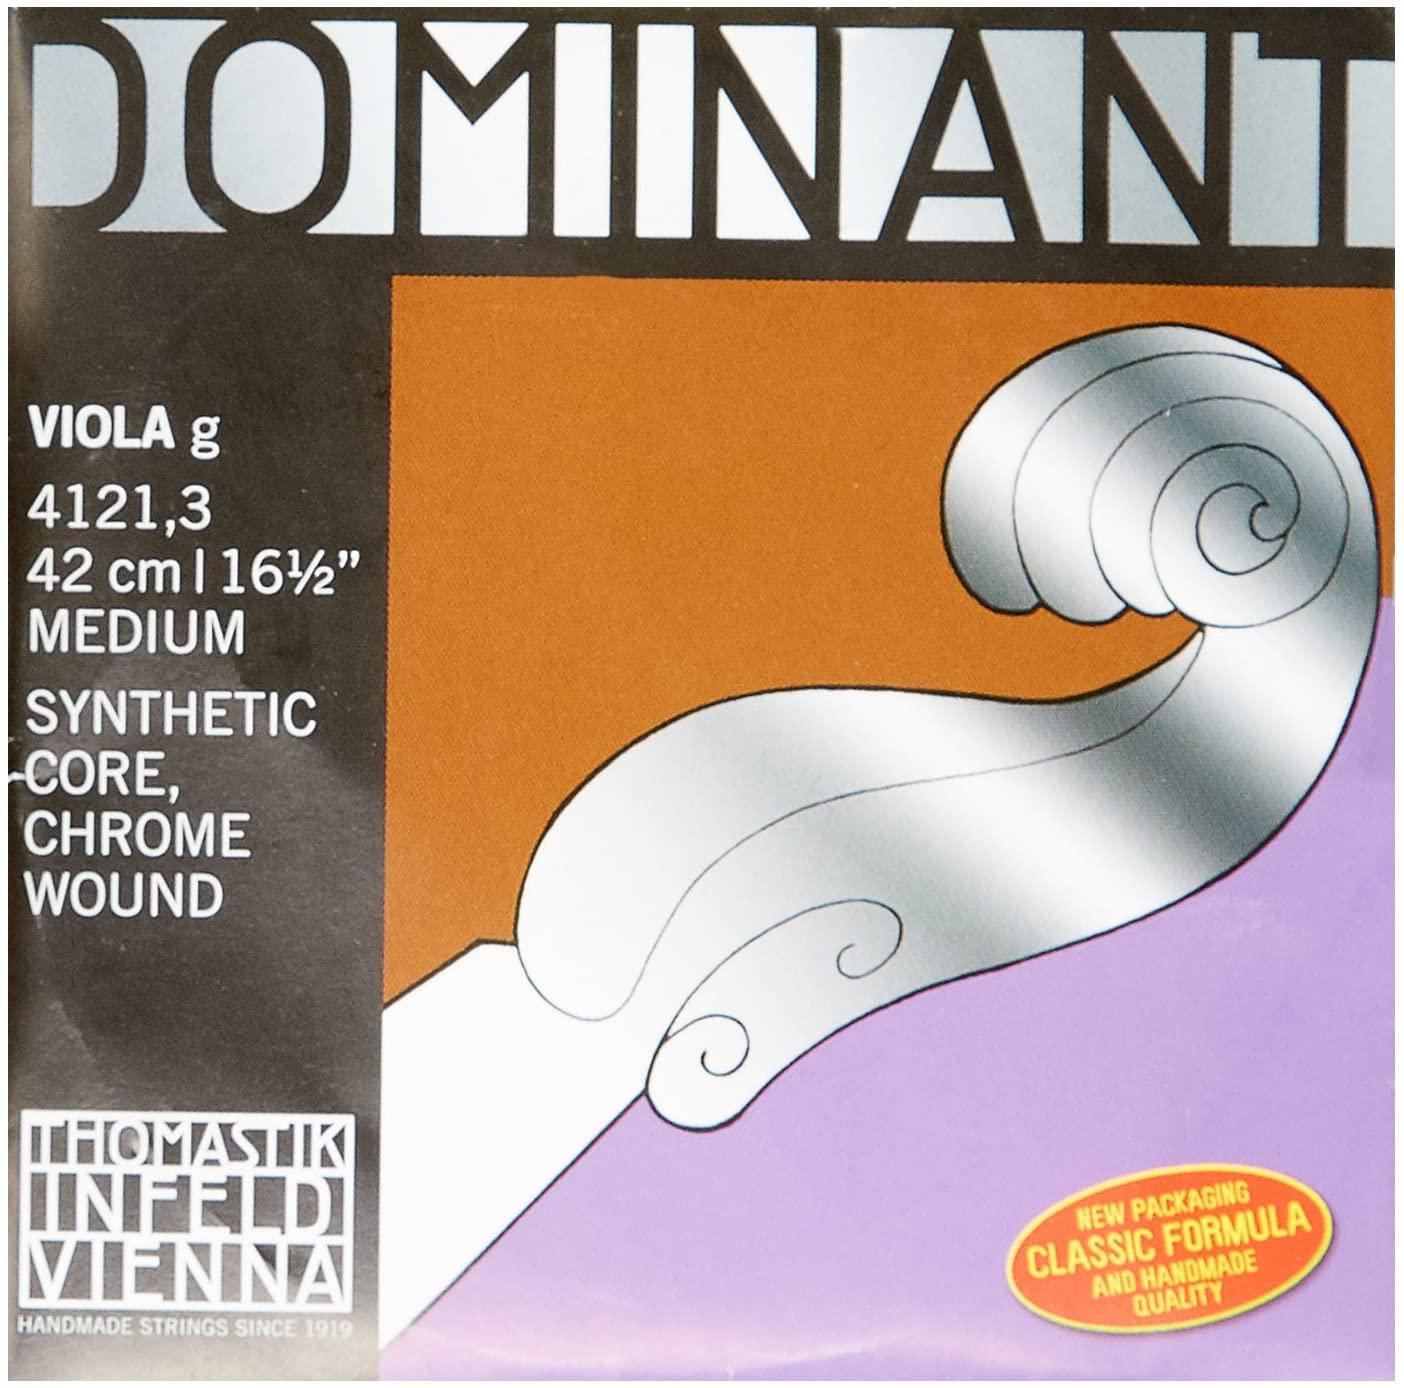 Thomastik-Infeld 4121.3 Dominant, Viola String, Single G String, 4/4 Size, 16.5-Inch, Perlon Core Chrome Wound